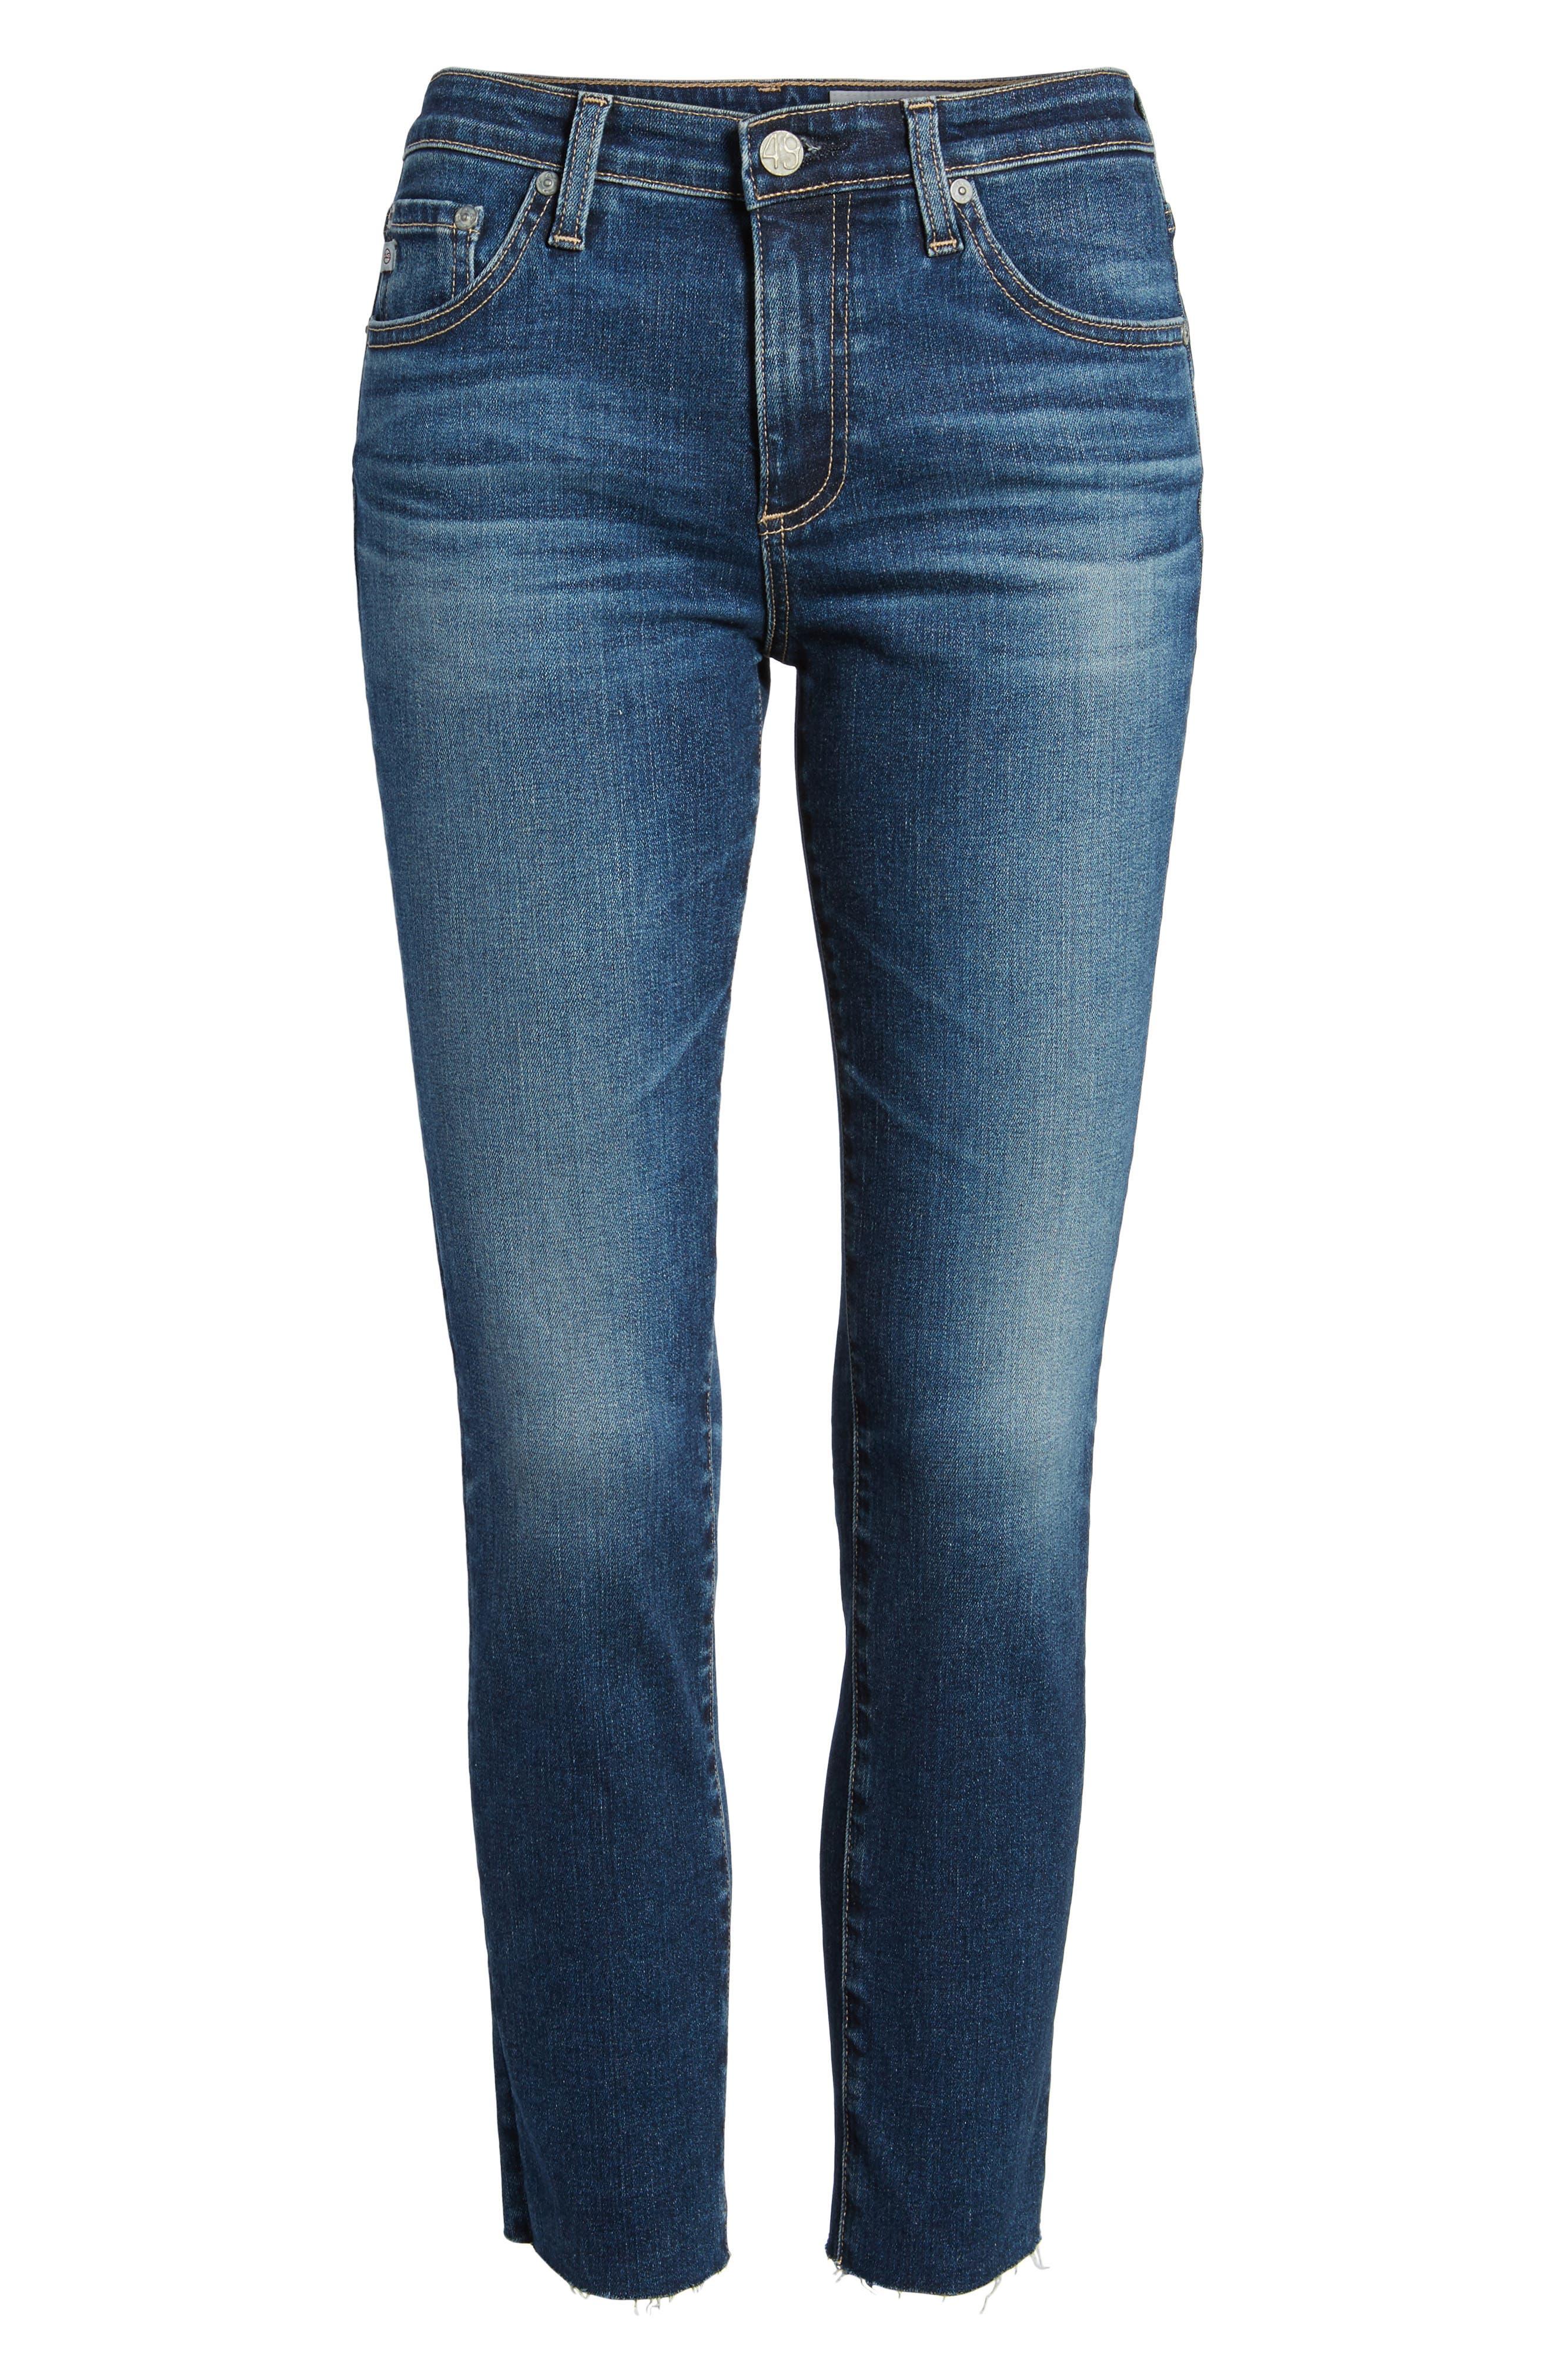 Prima Crop Skinny Jeans,                             Alternate thumbnail 7, color,                             5 YEAR INDIGO AVE